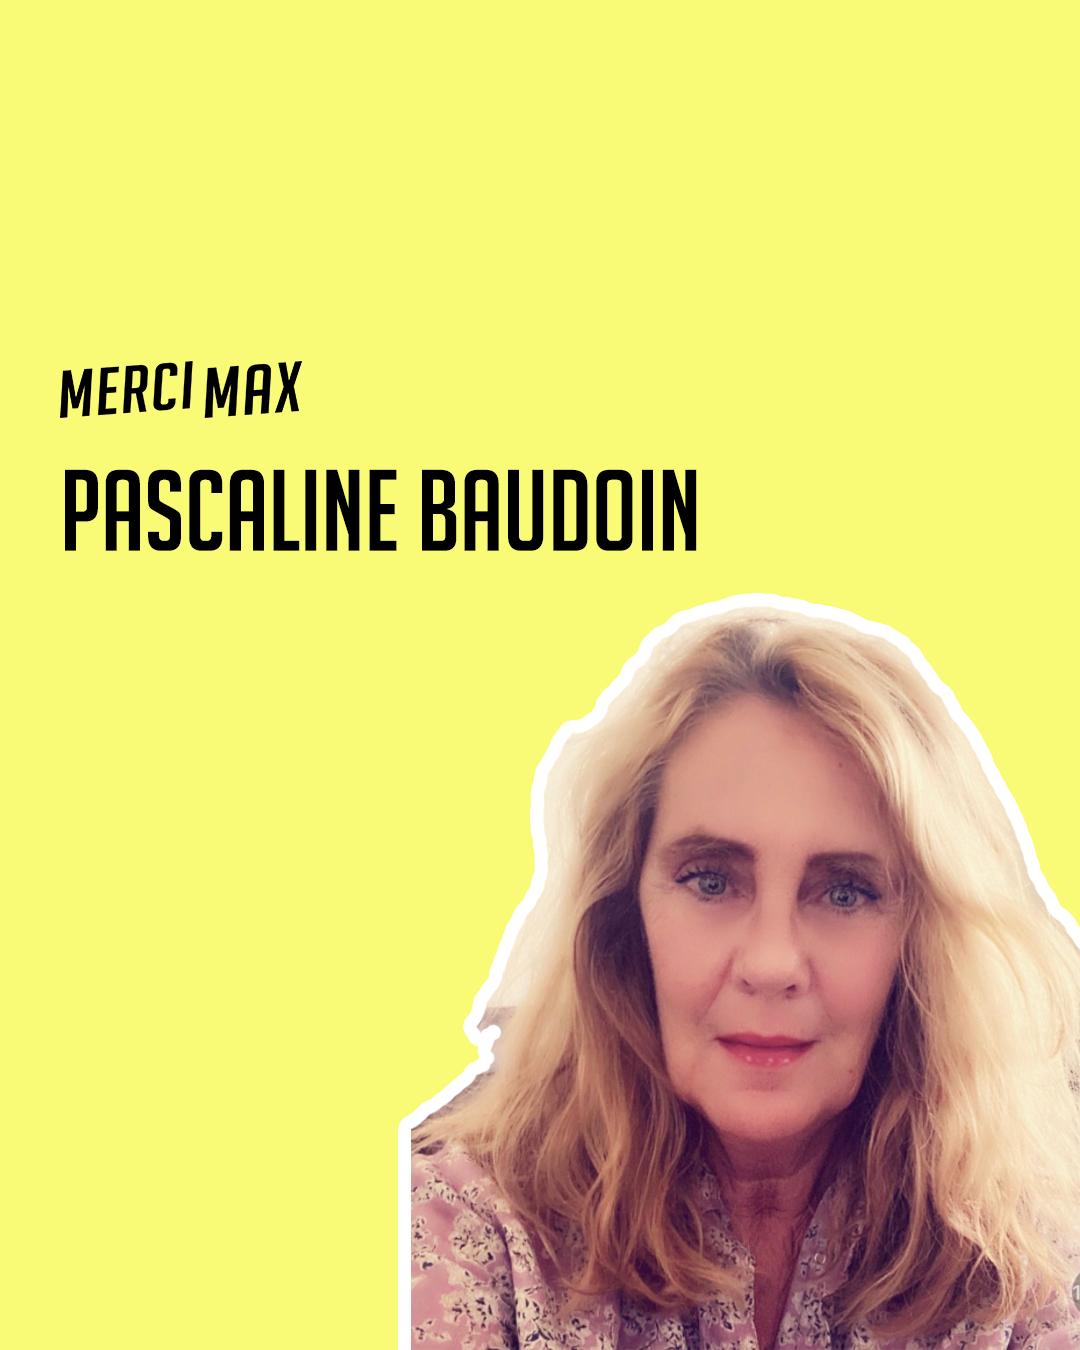 Pacaline, Max Fashion